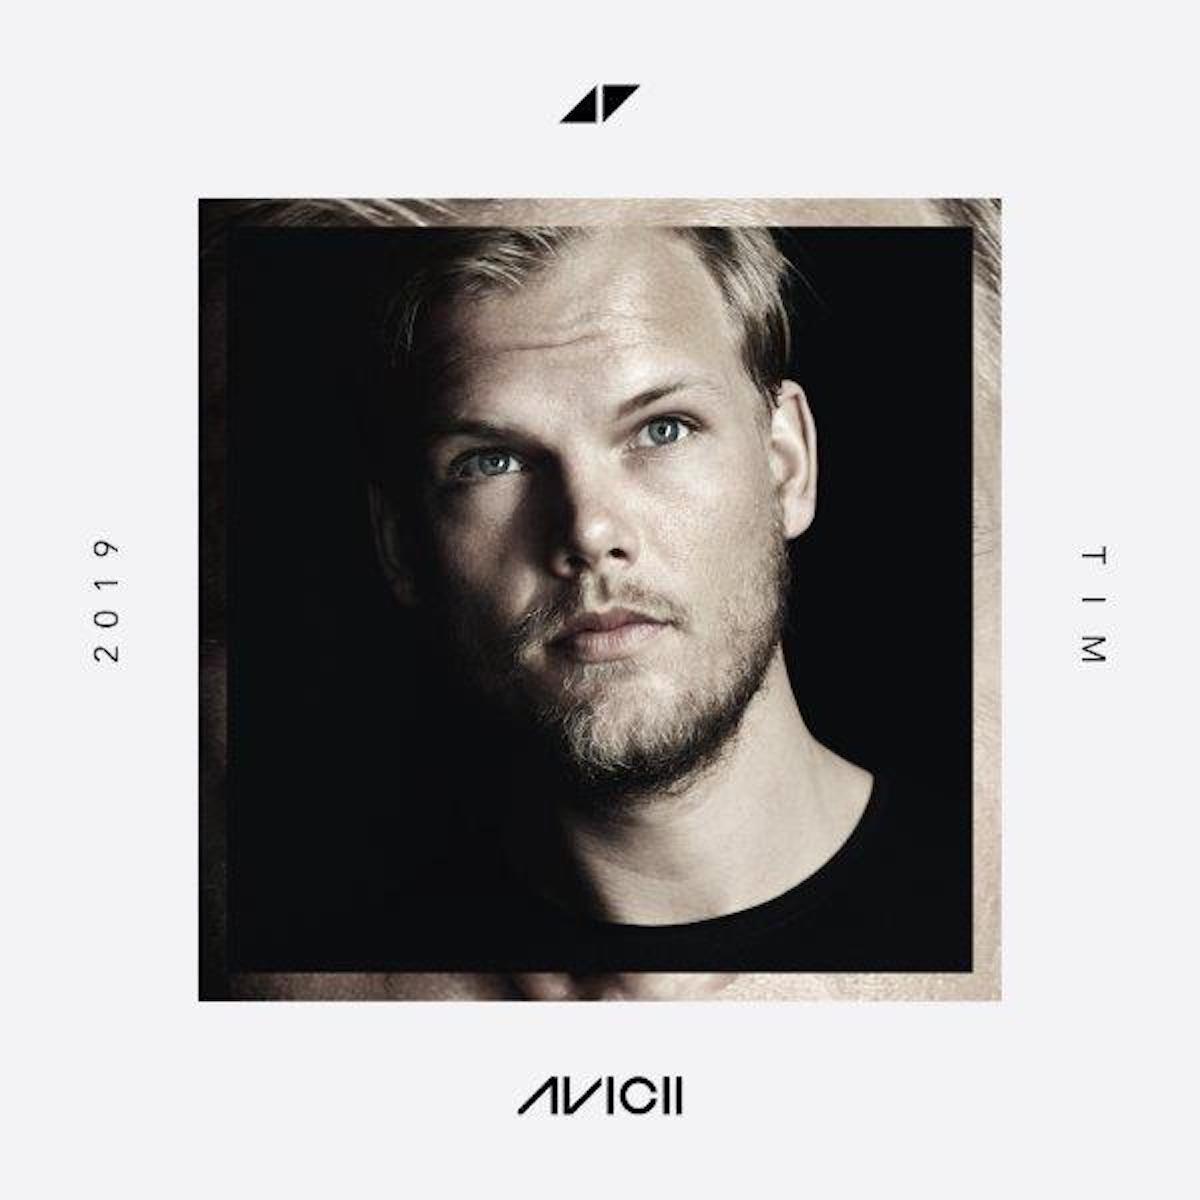 Avicii『TIM』アルバムジャケット写真